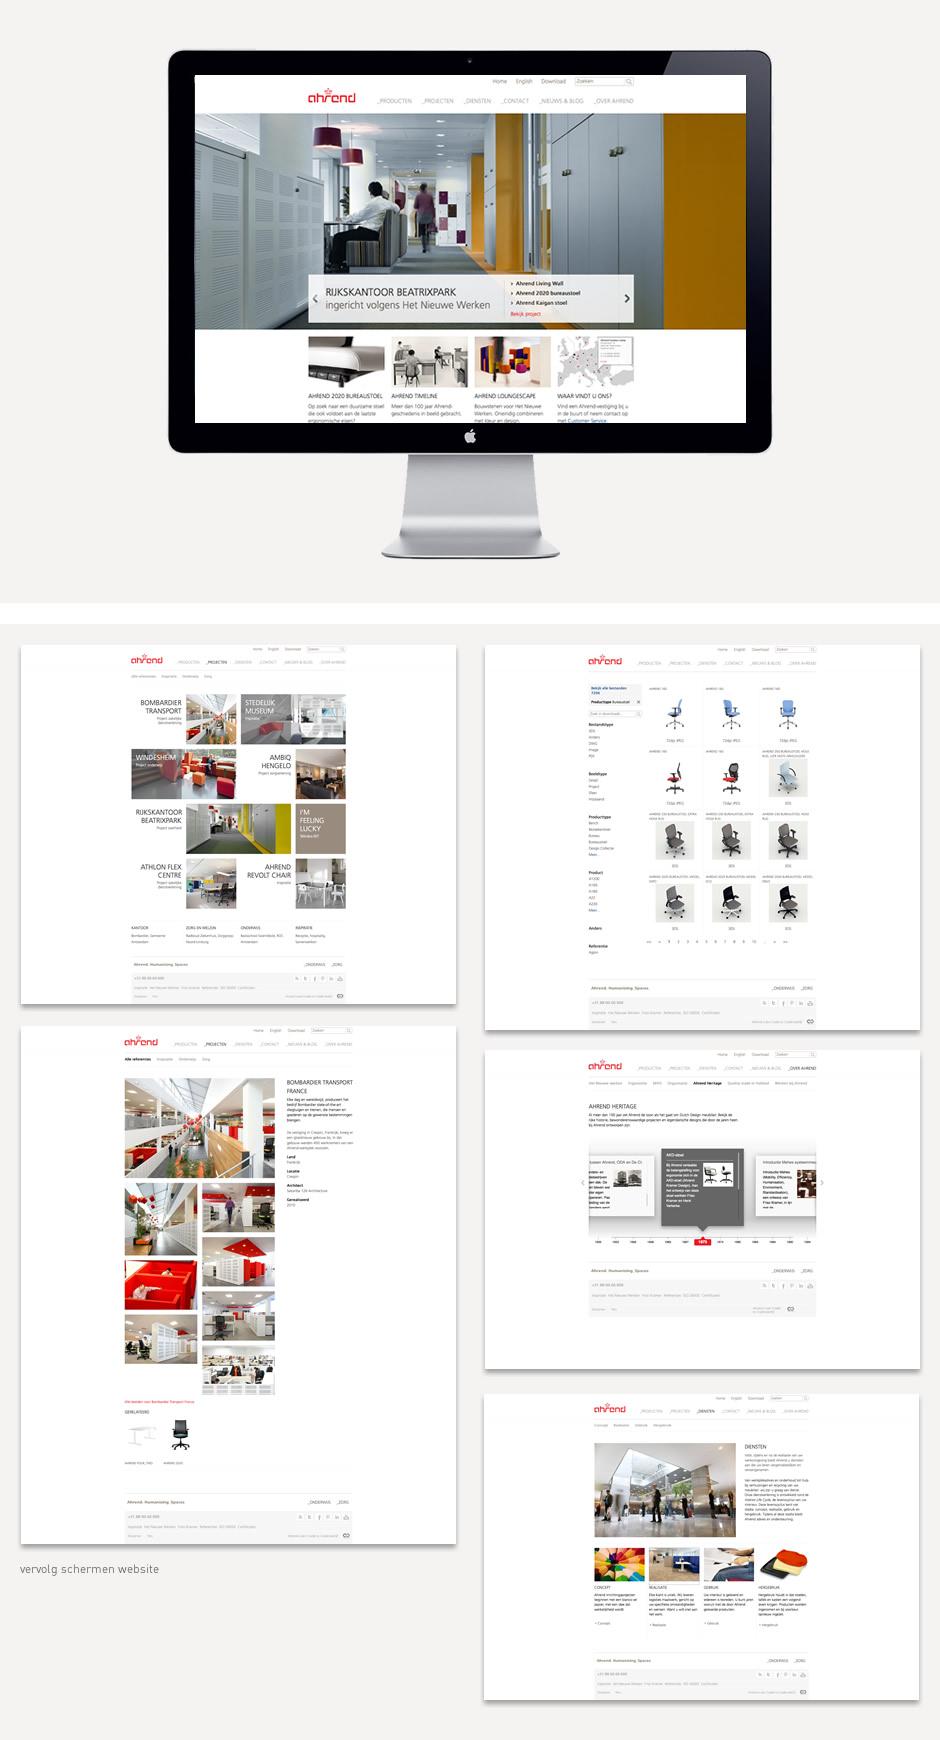 ahrend website 2013